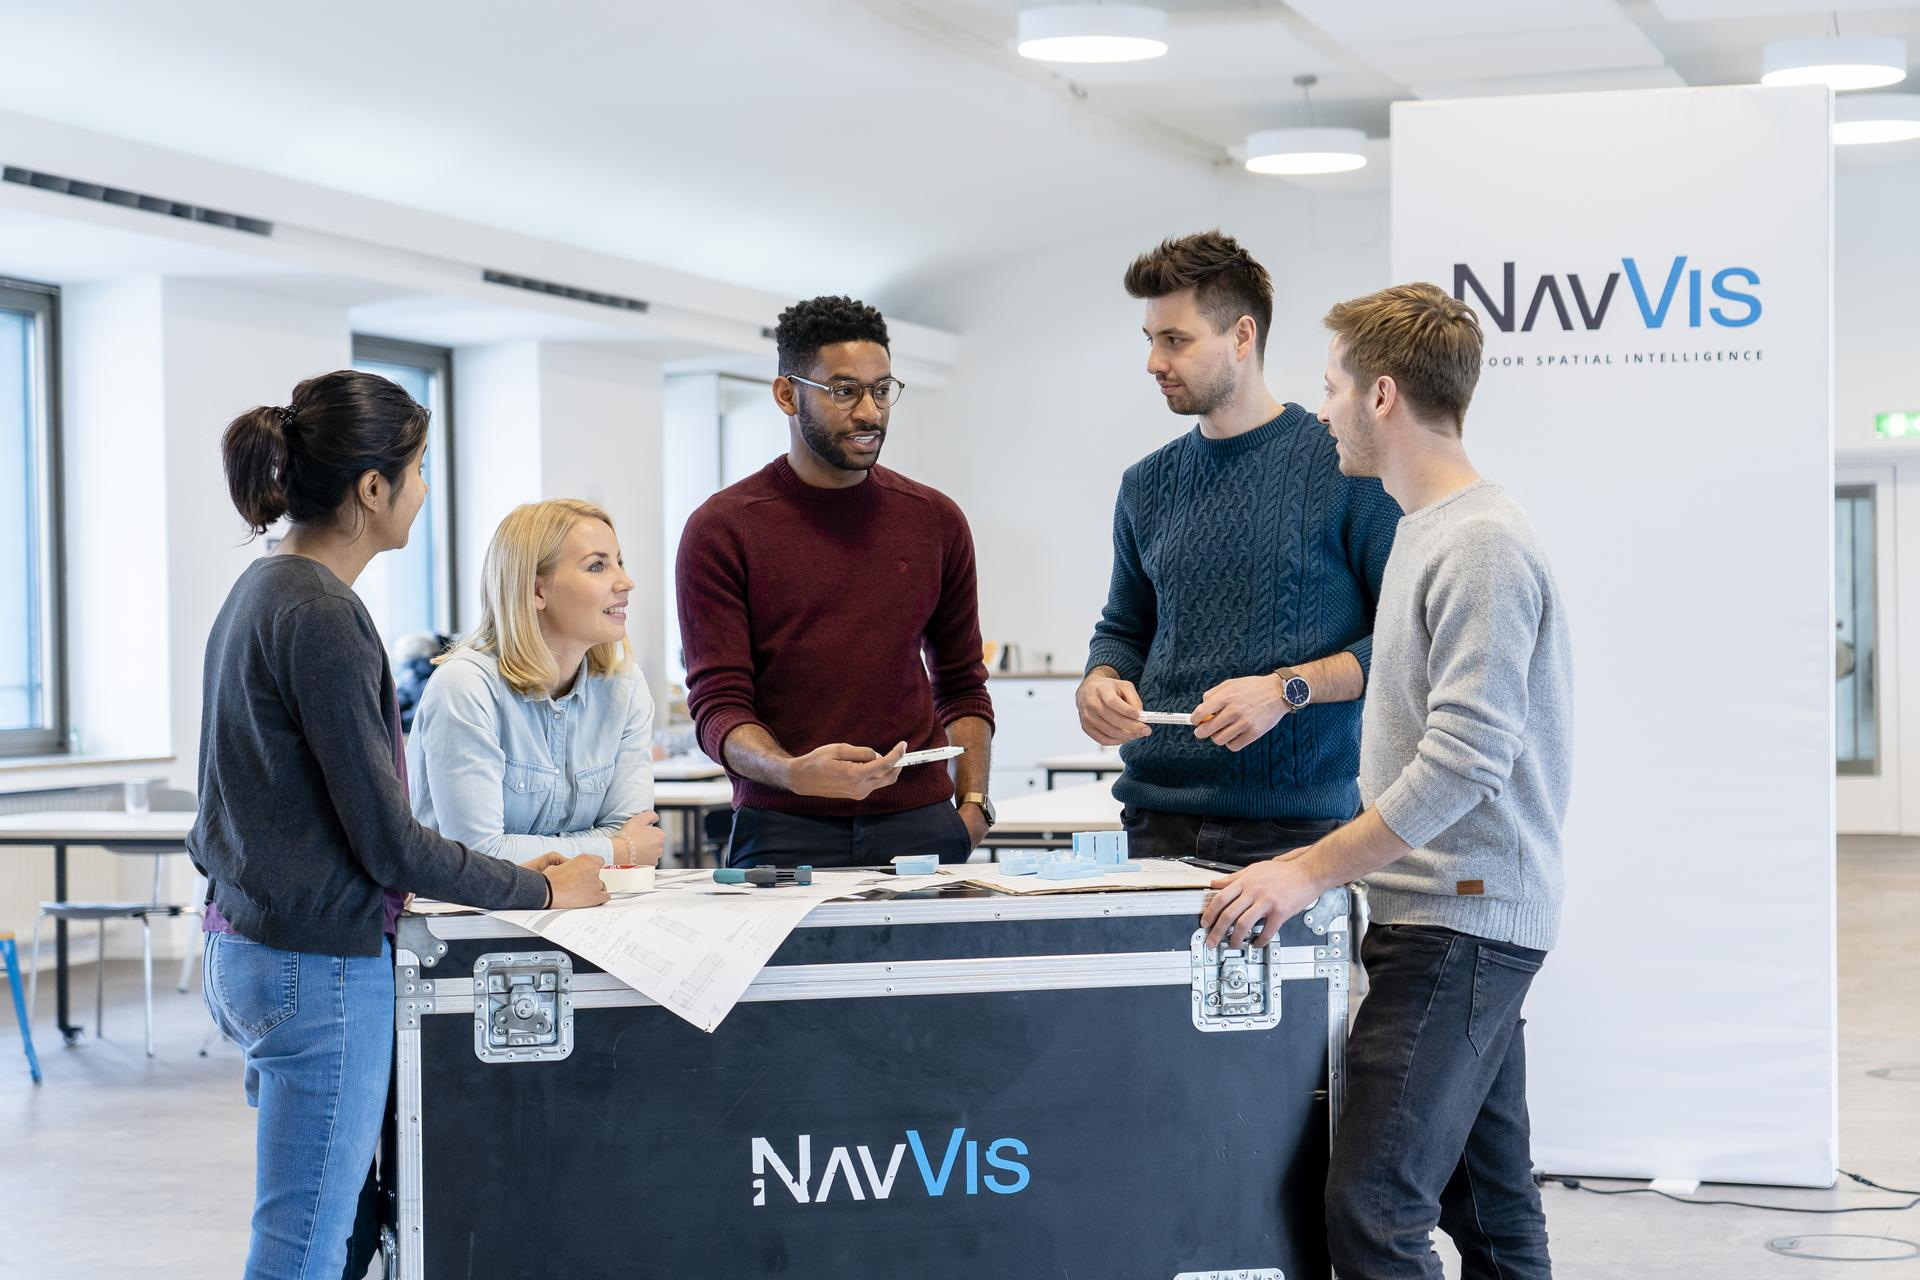 NavVis-people-6838 (2)